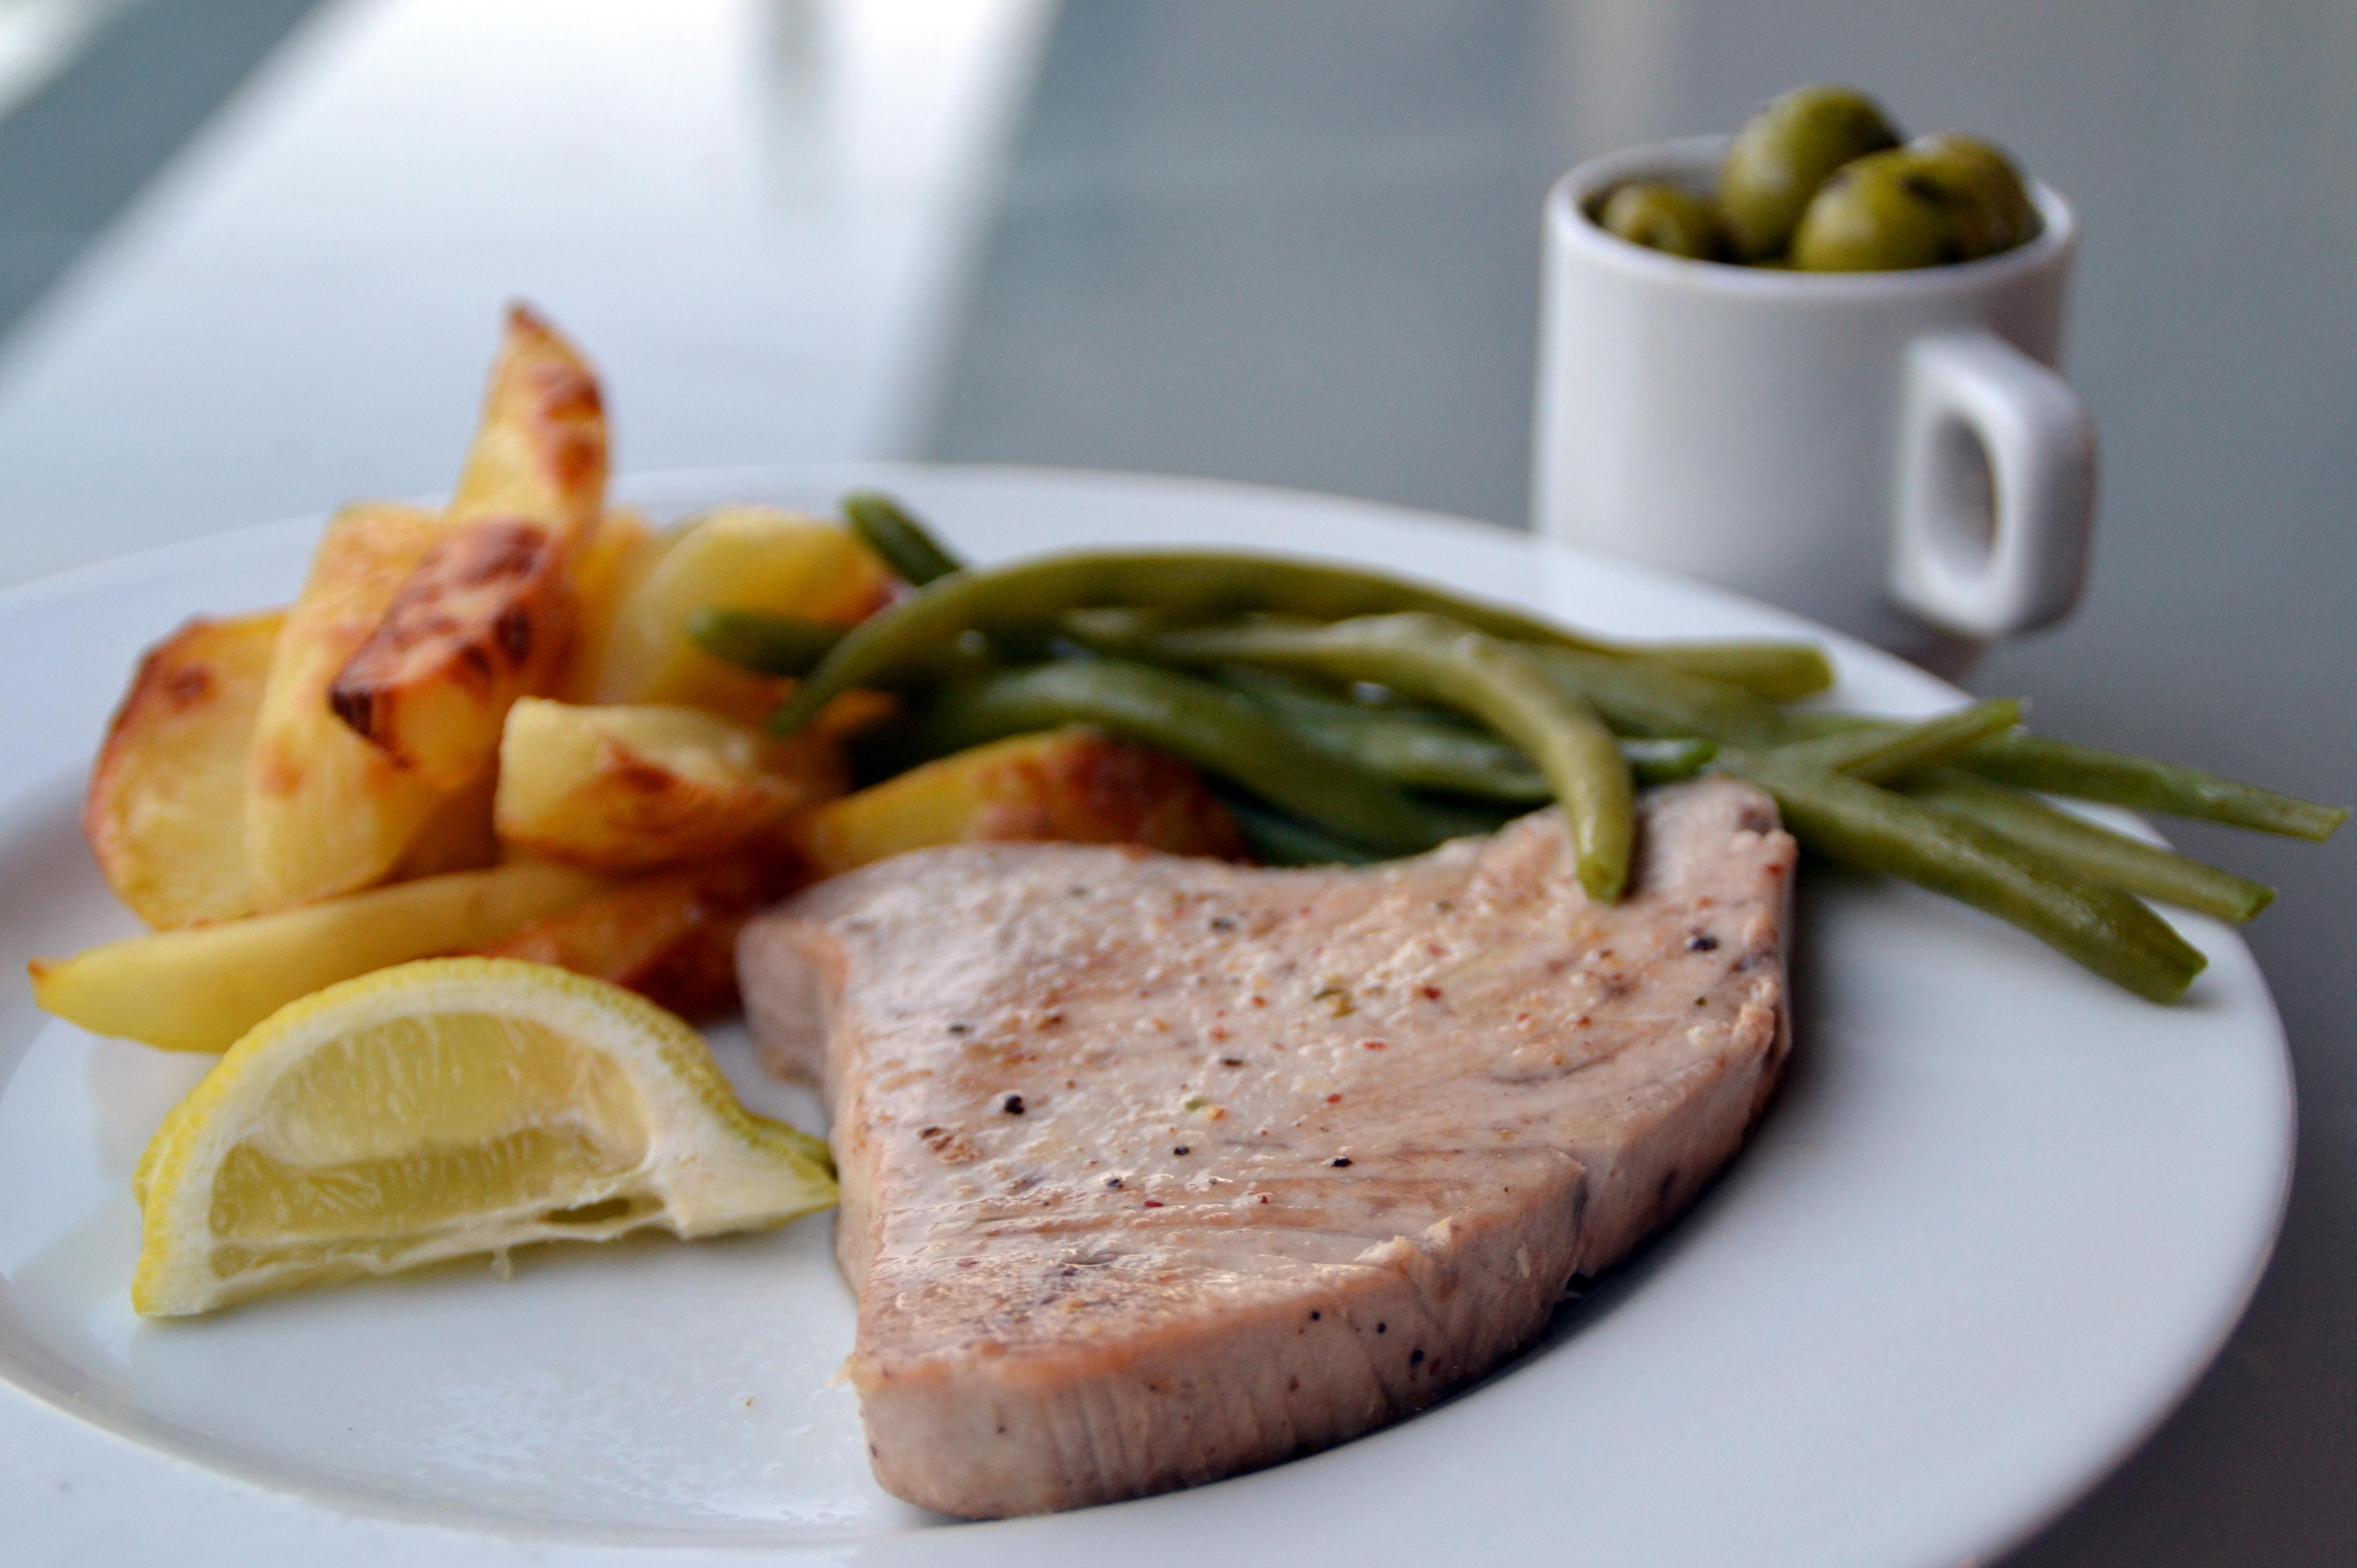 sås till stekt tonfisk